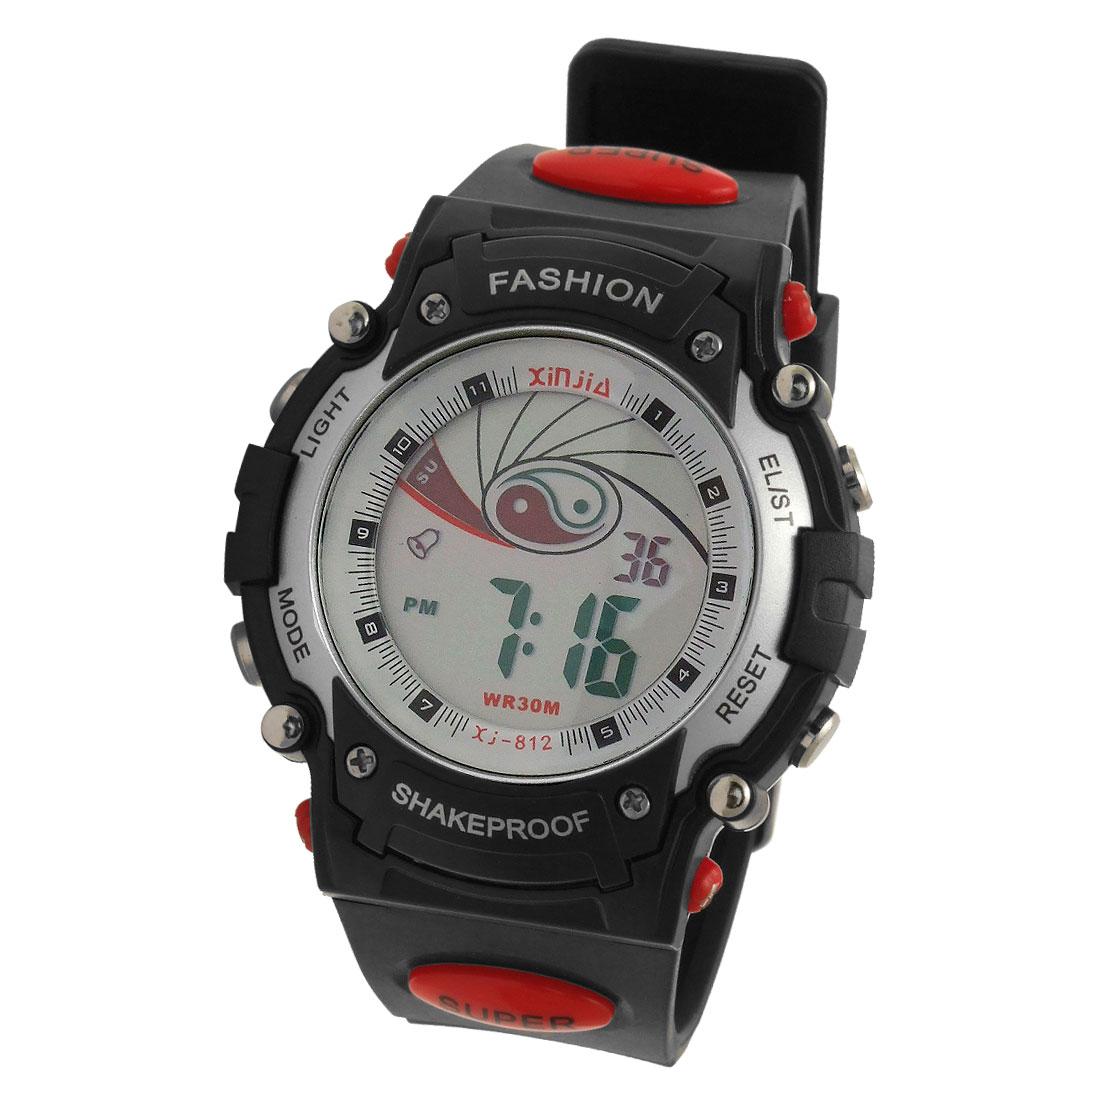 Cool Black Digital Plastic Band Men's Shakeproof Wrist Watch